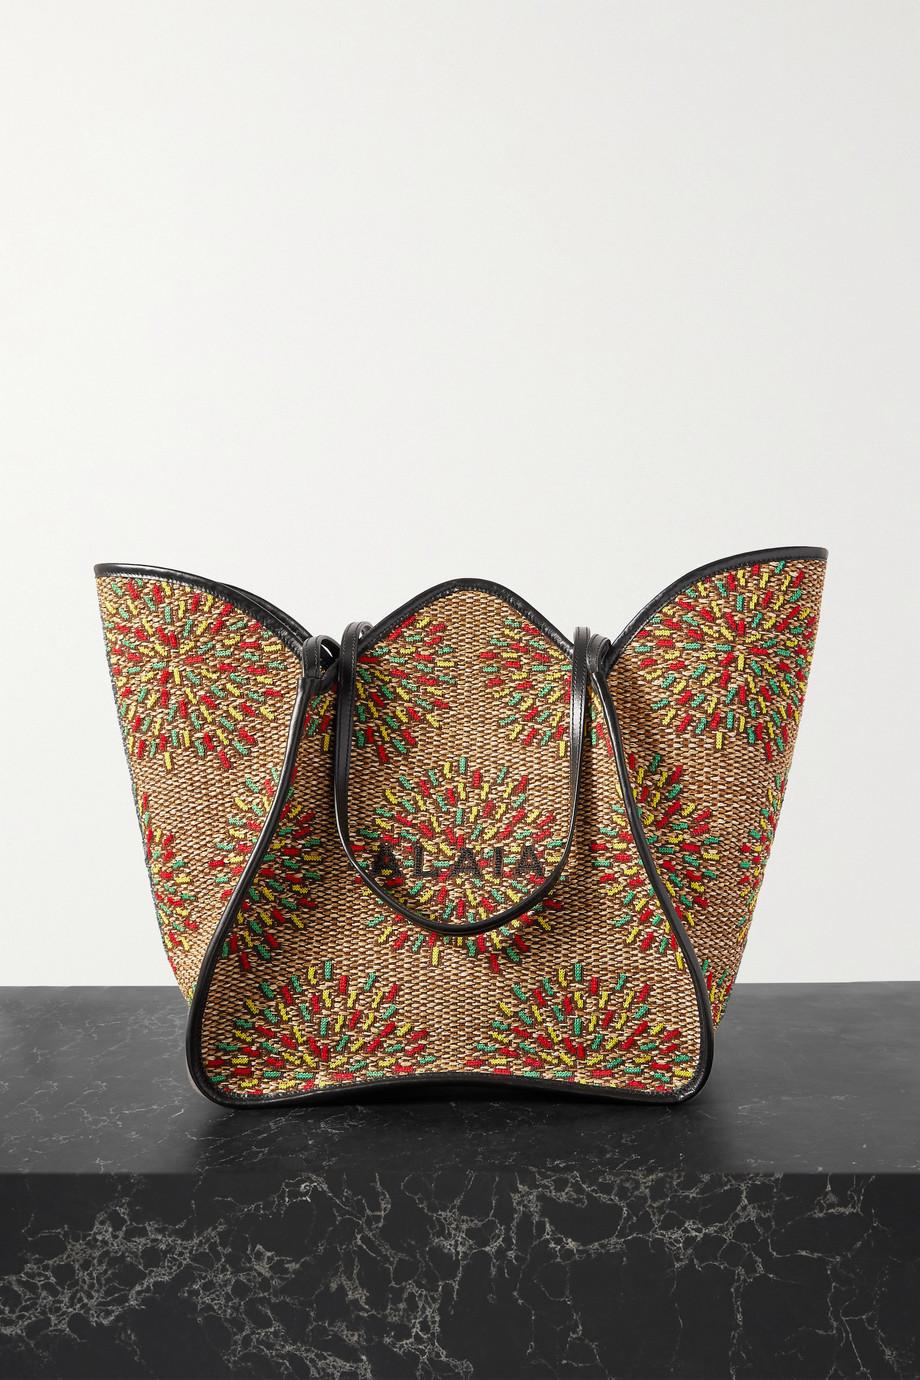 Alaïa Lili 24 leather-trimmed jacquard tote